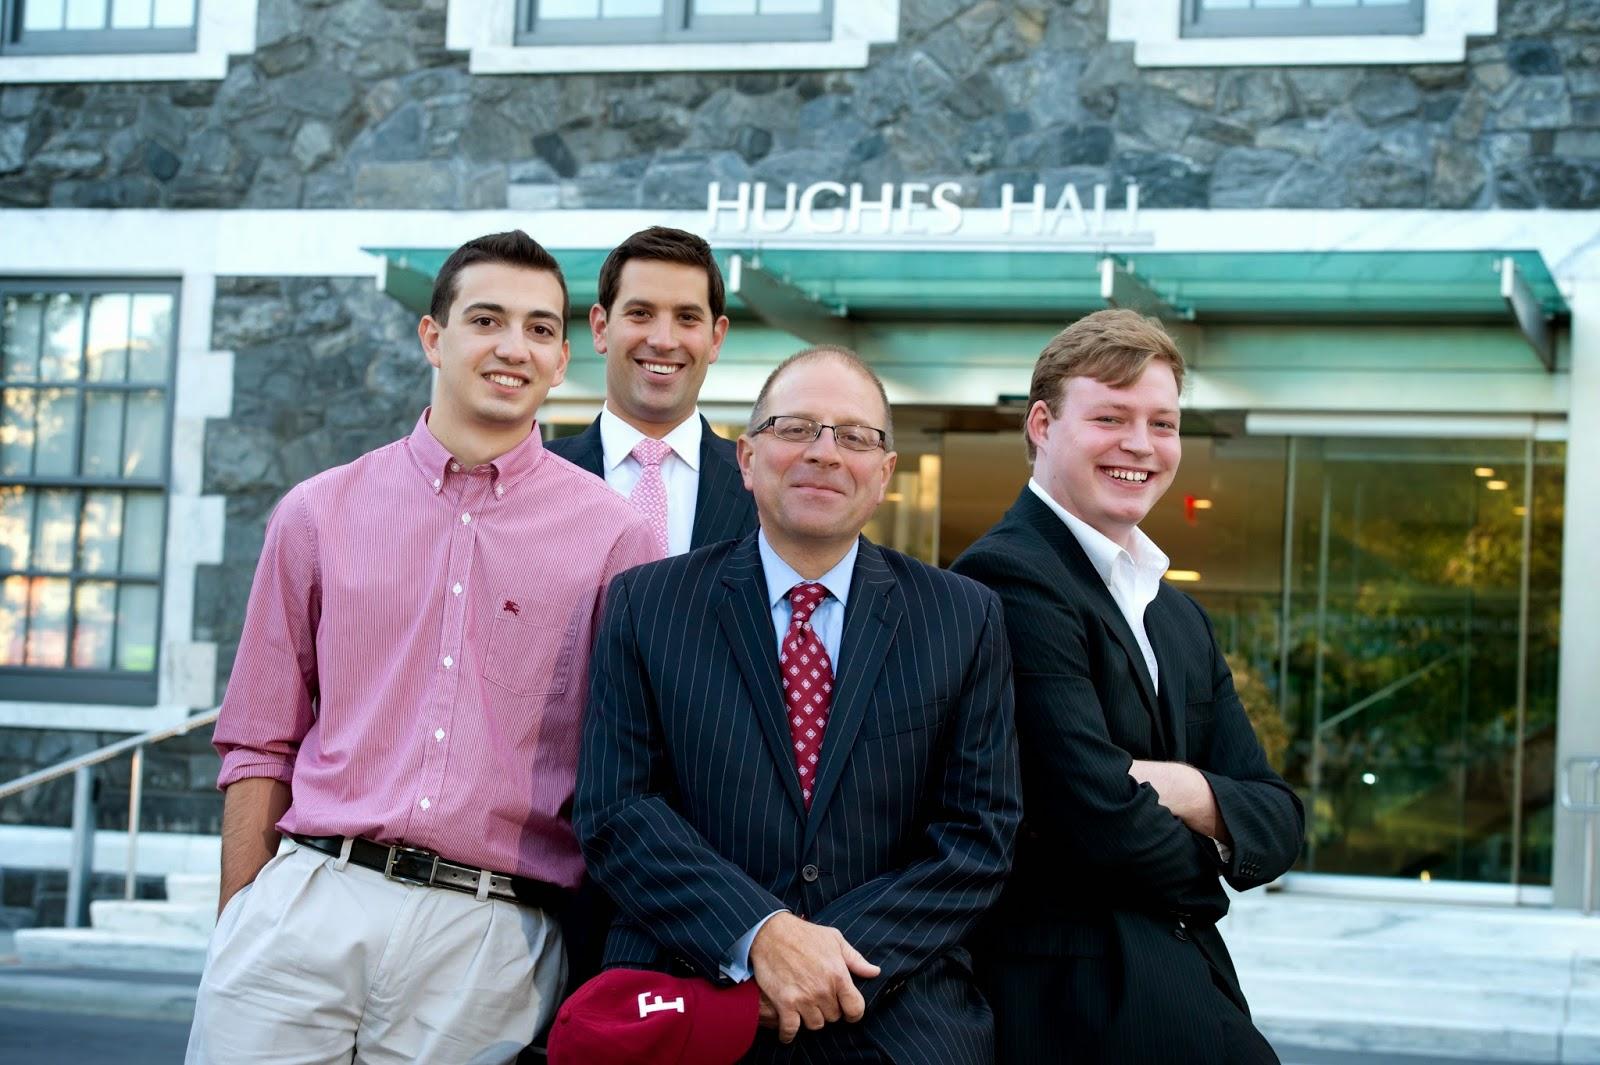 Alumni Spotlight: Investment Adviser Hires, Inspires Fordham Interns